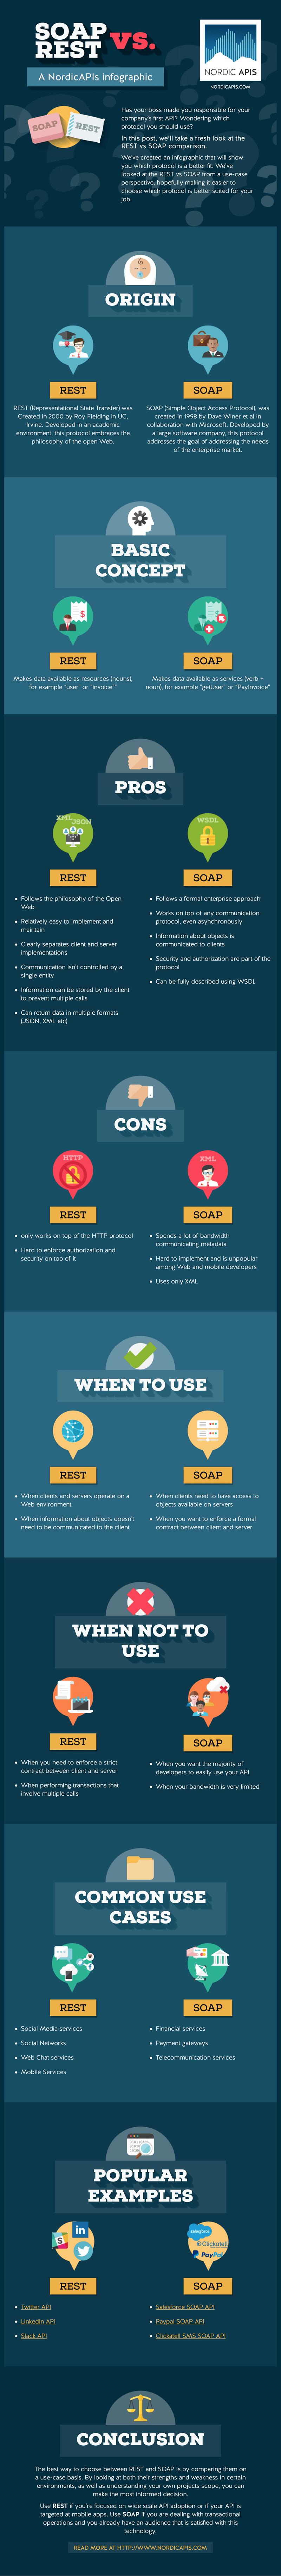 soap_vs_rest_infographics